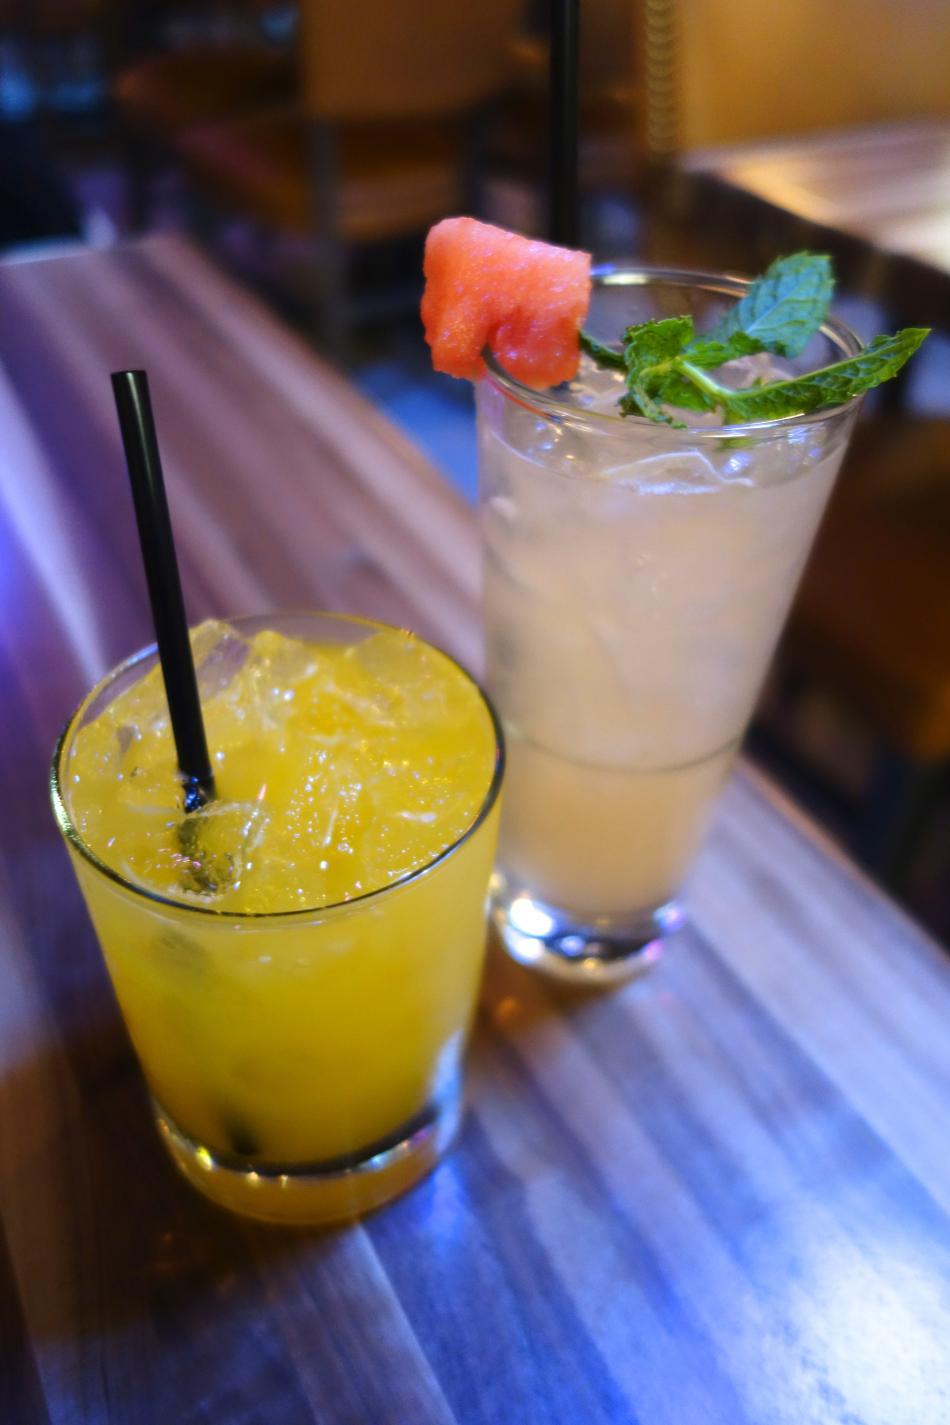 Article 24 Cocktails